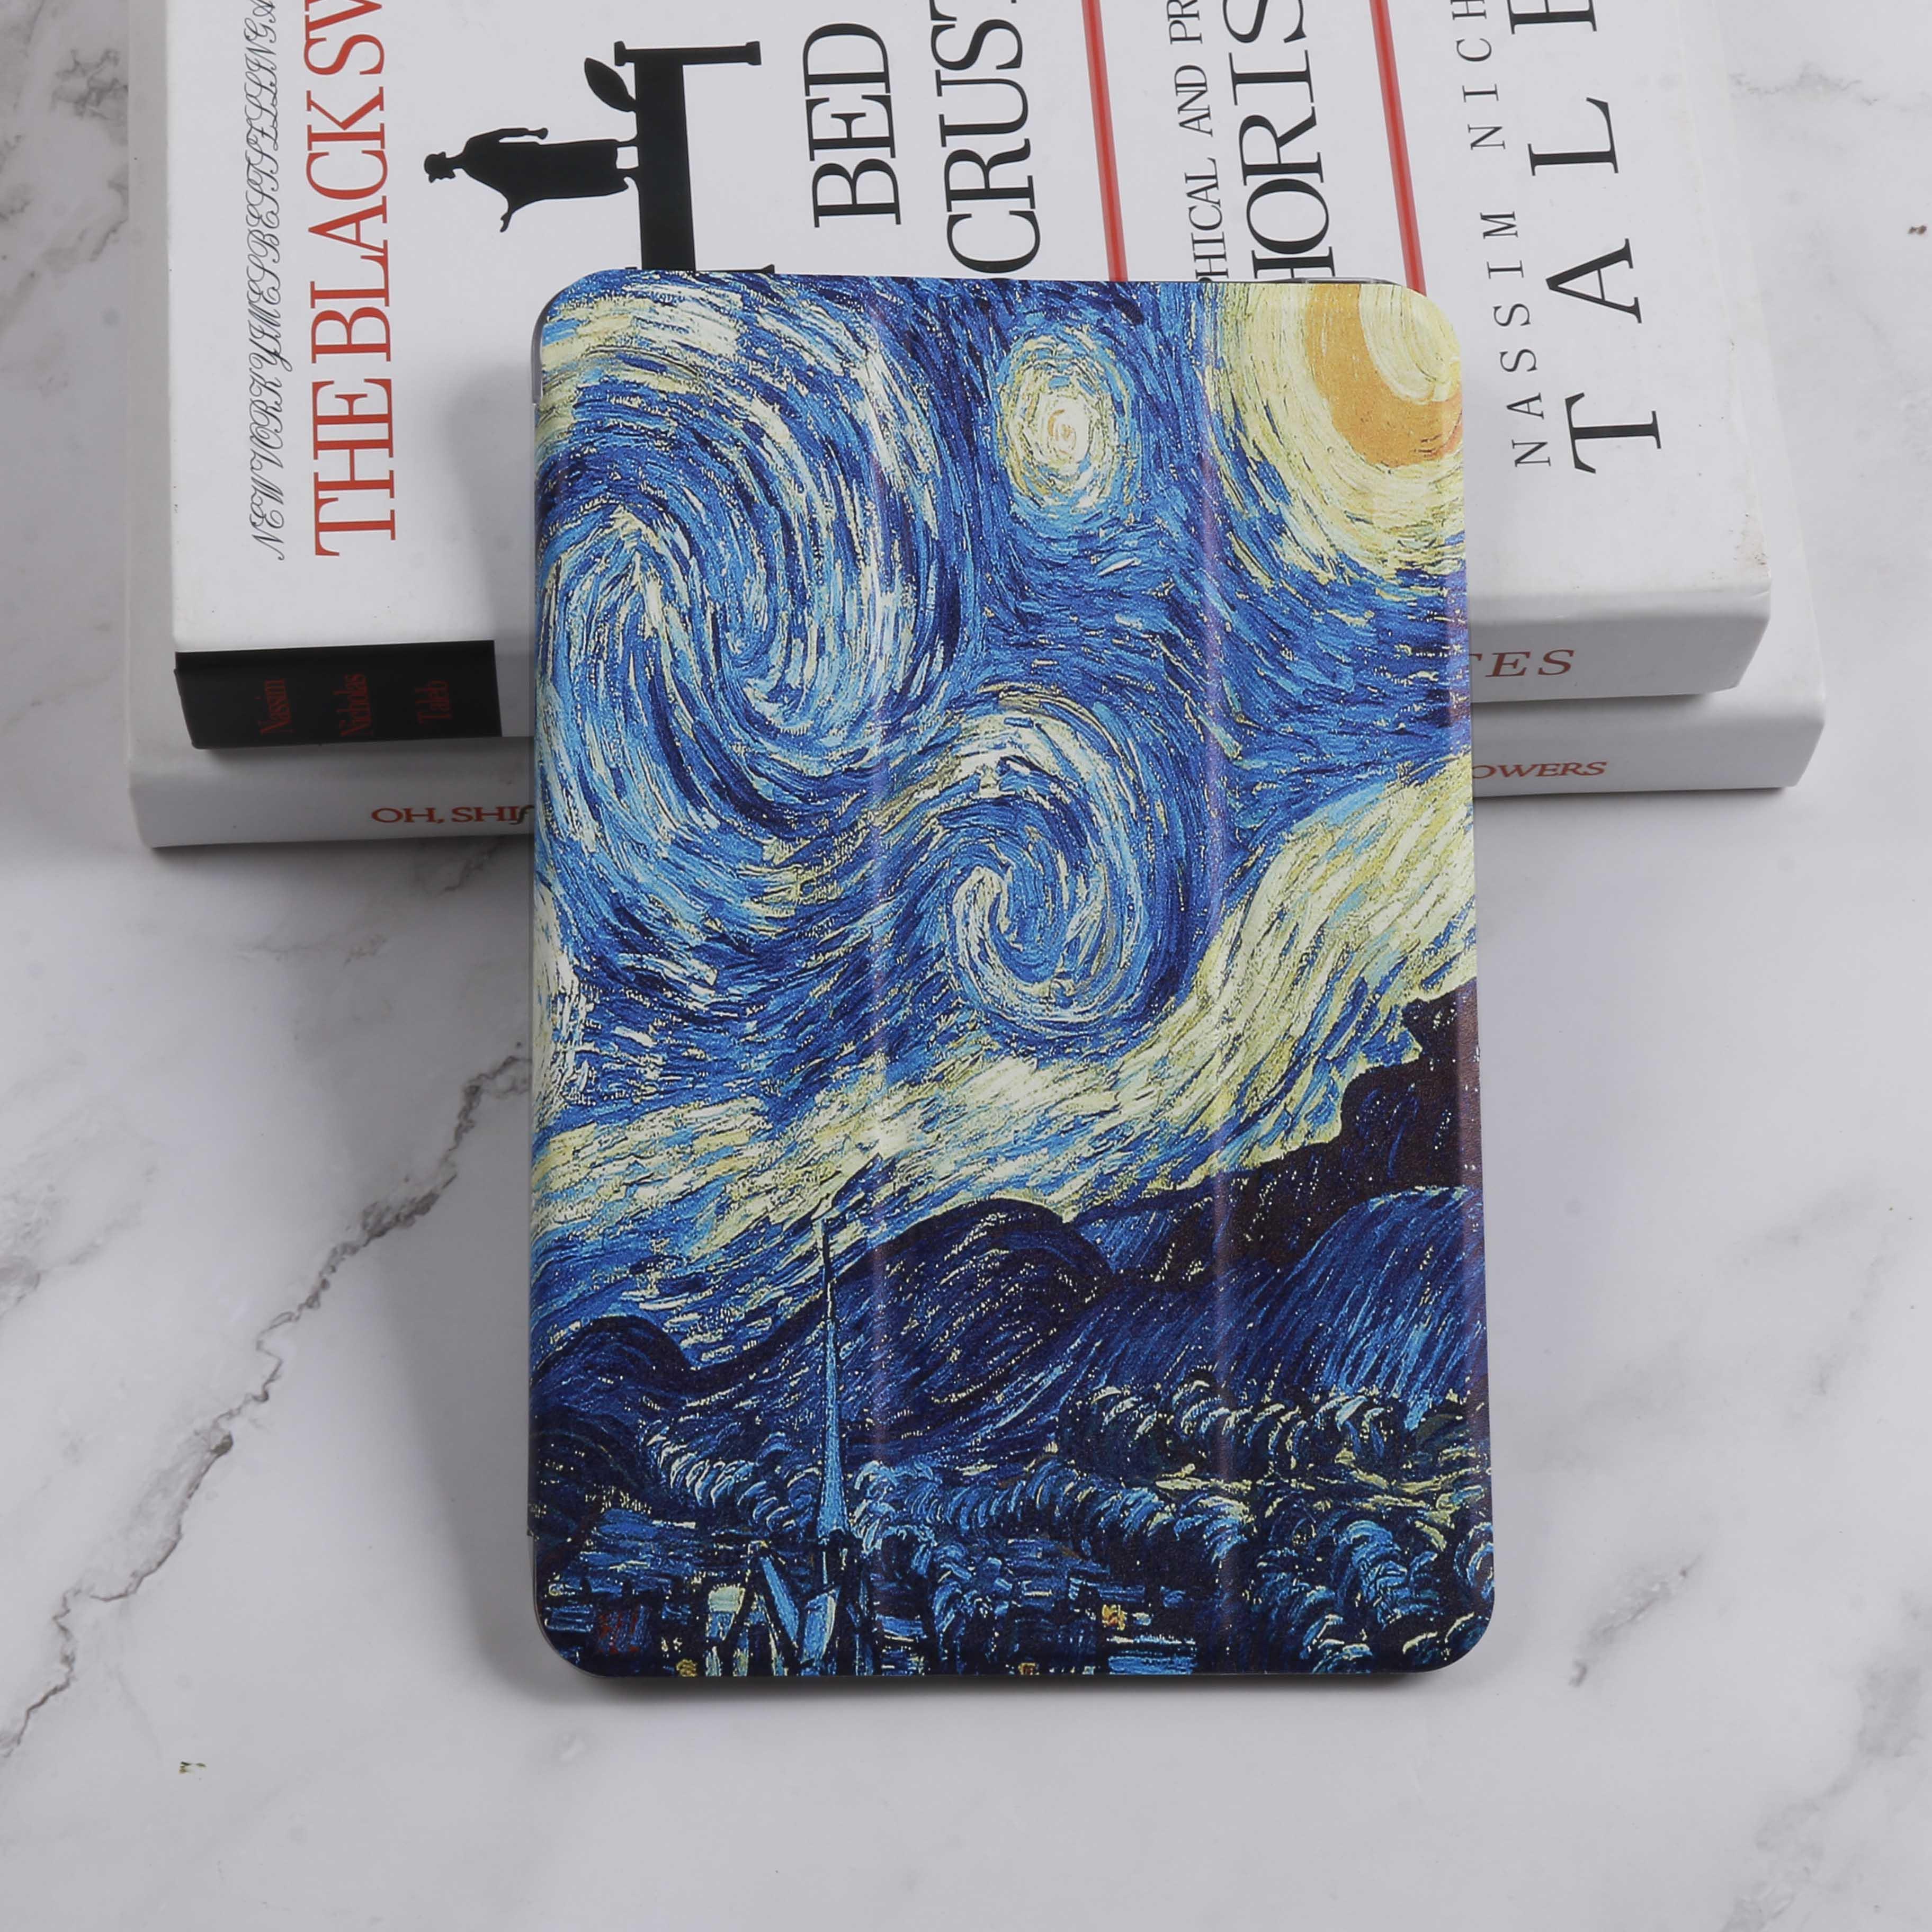 Tablet Case For Samsung Galaxy Tab A 9.7 SM T550 T555 / Tab E 9.6 Inch SM-T560 SM-T561 9.6\